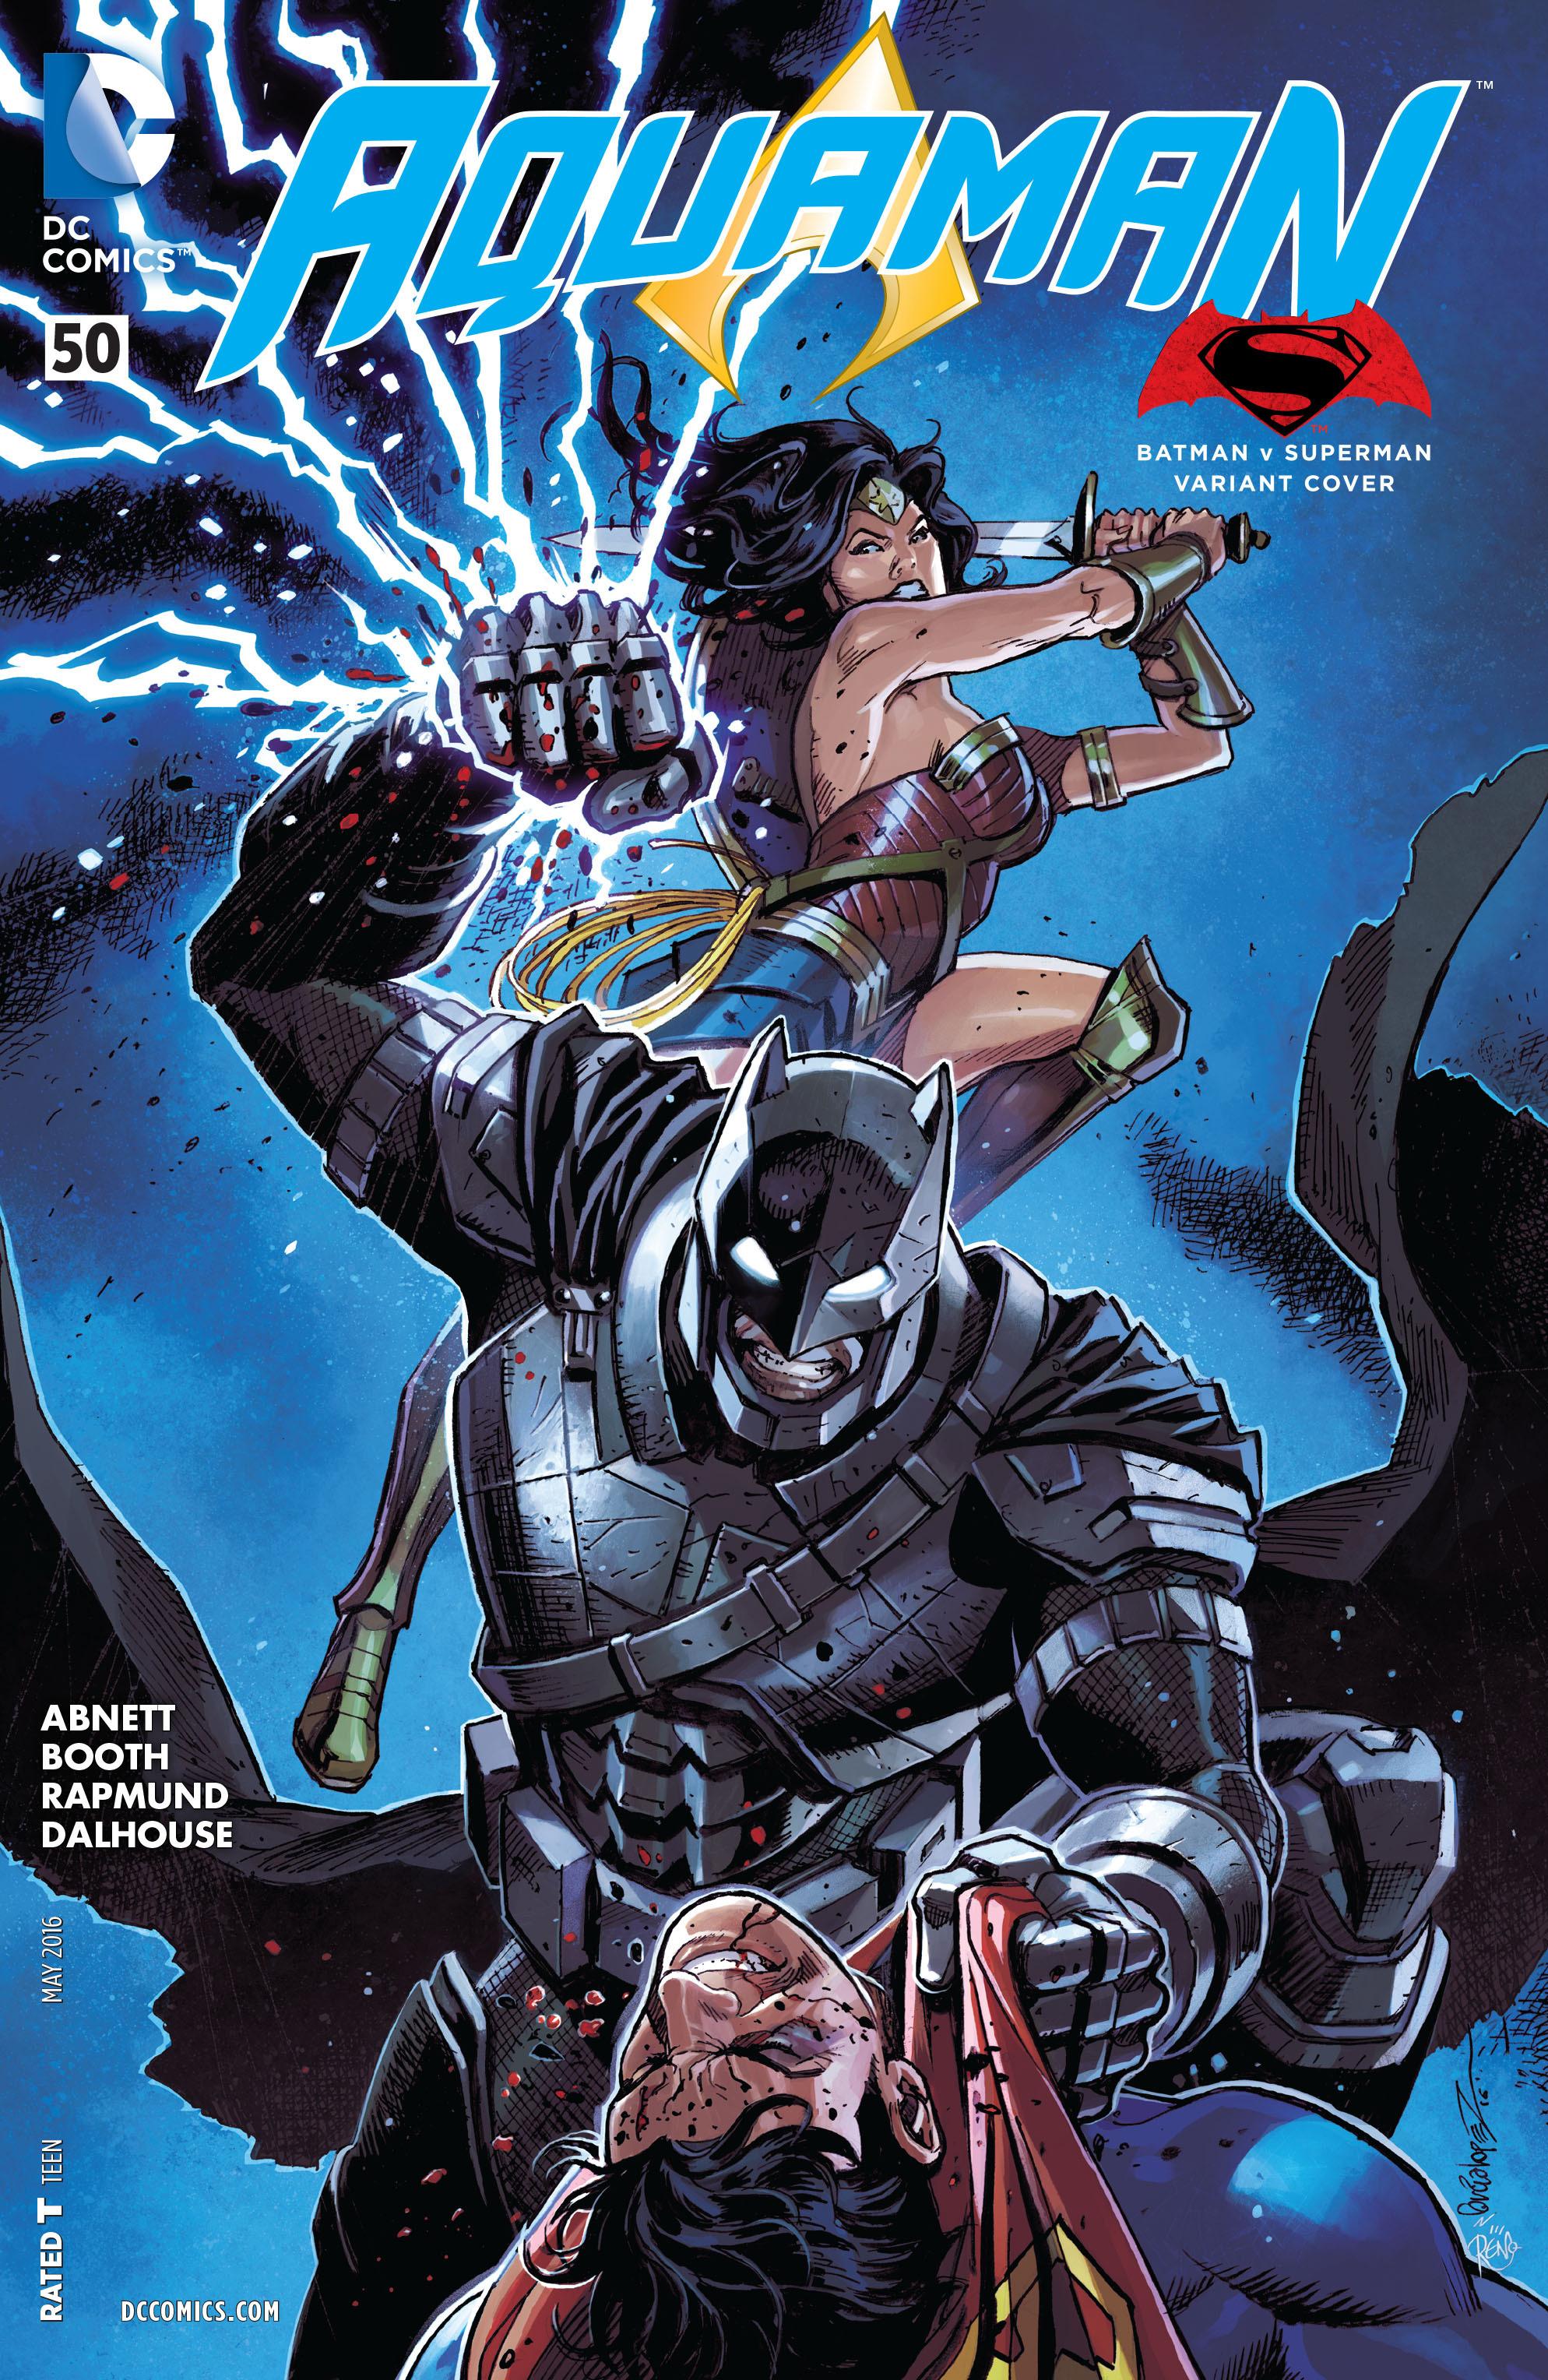 Read online Aquaman (2011) comic -  Issue #50 - 3